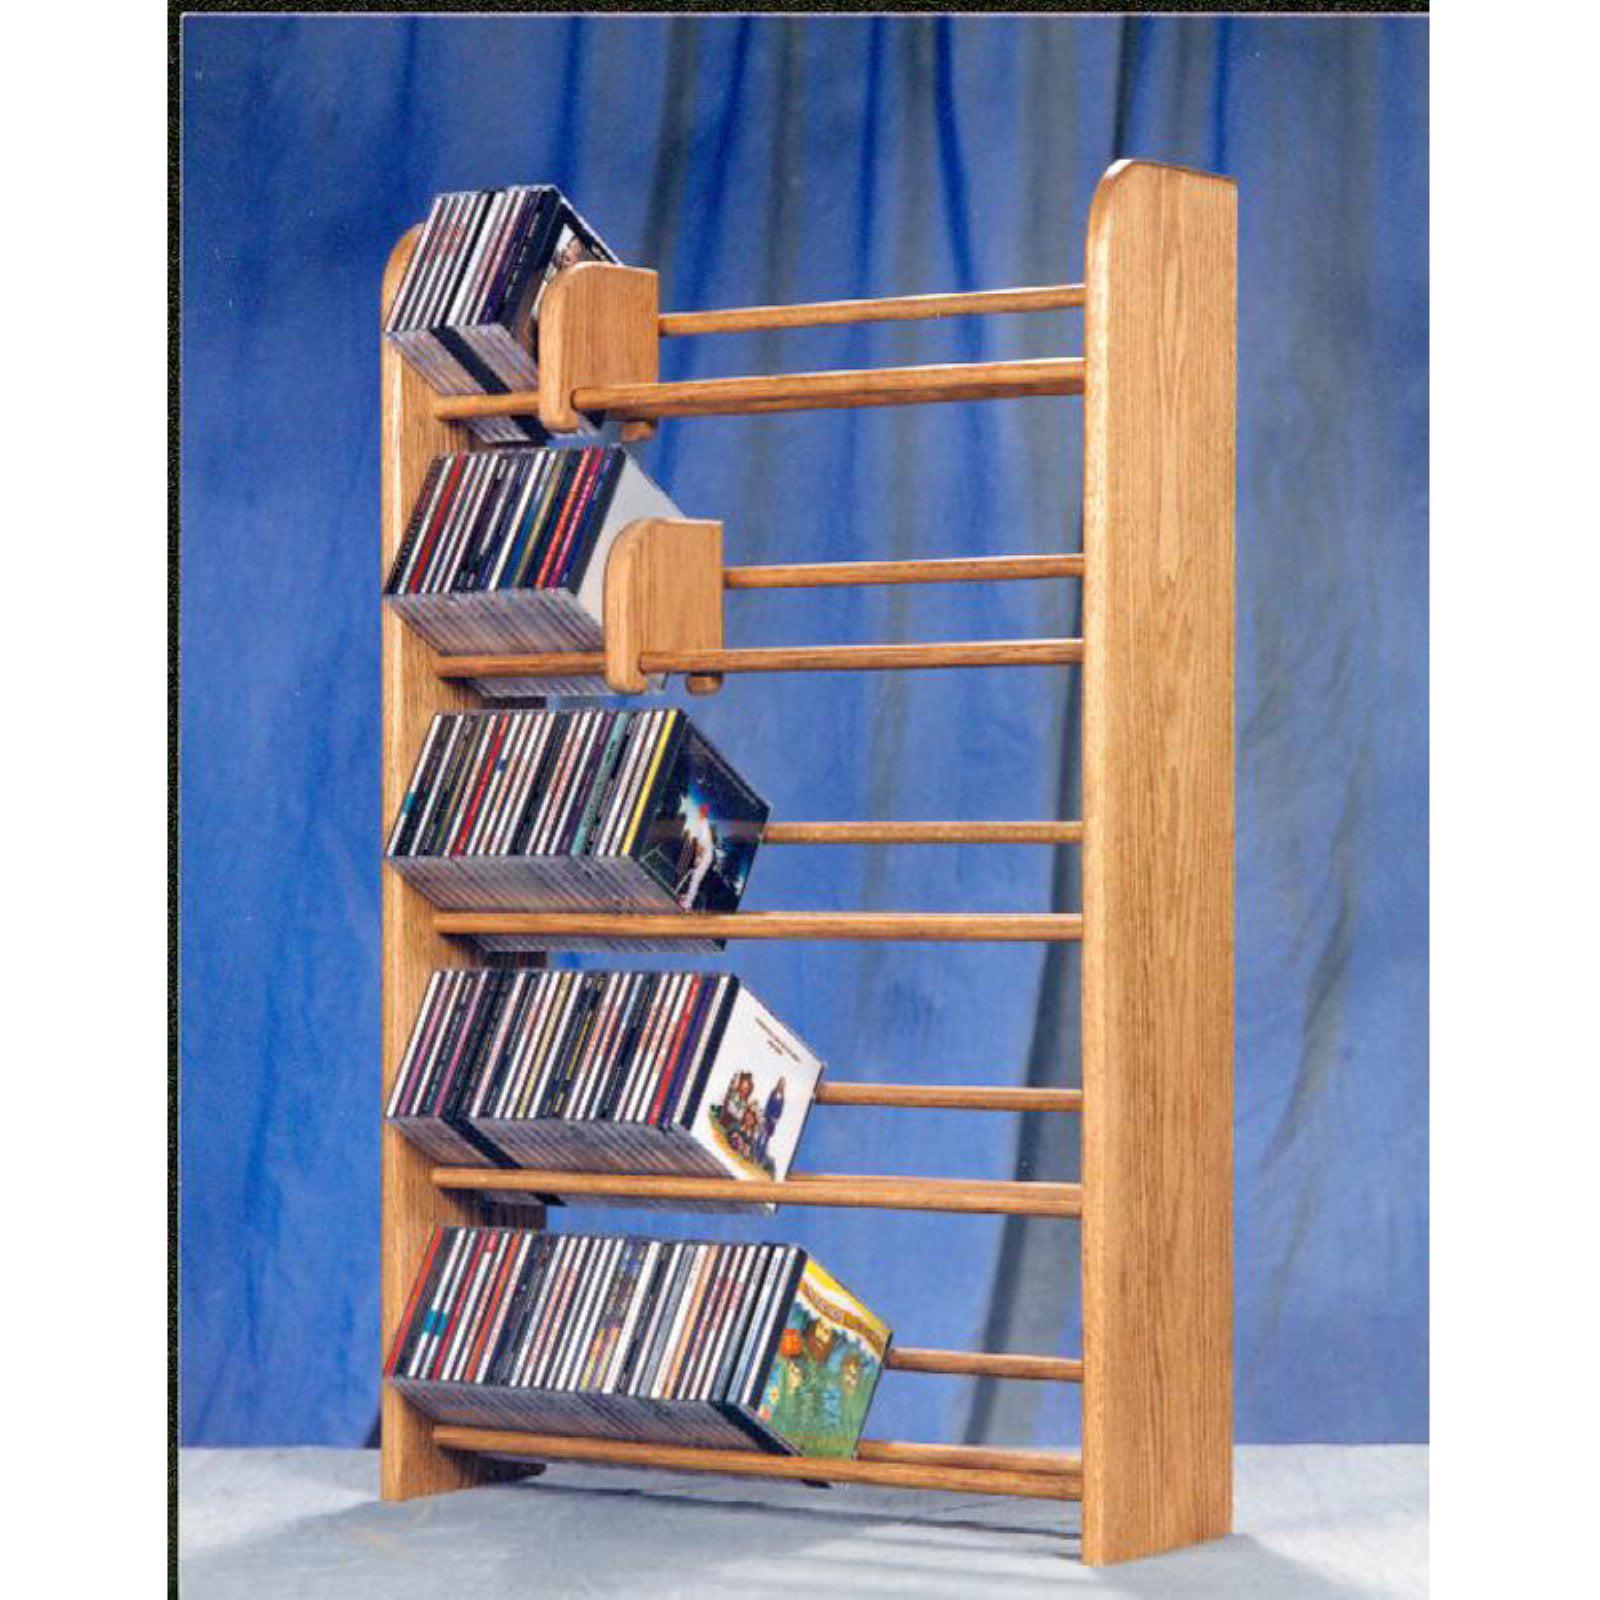 The Wood Shed Solid Oak 5 Row Dowel 275 CD Media Rack